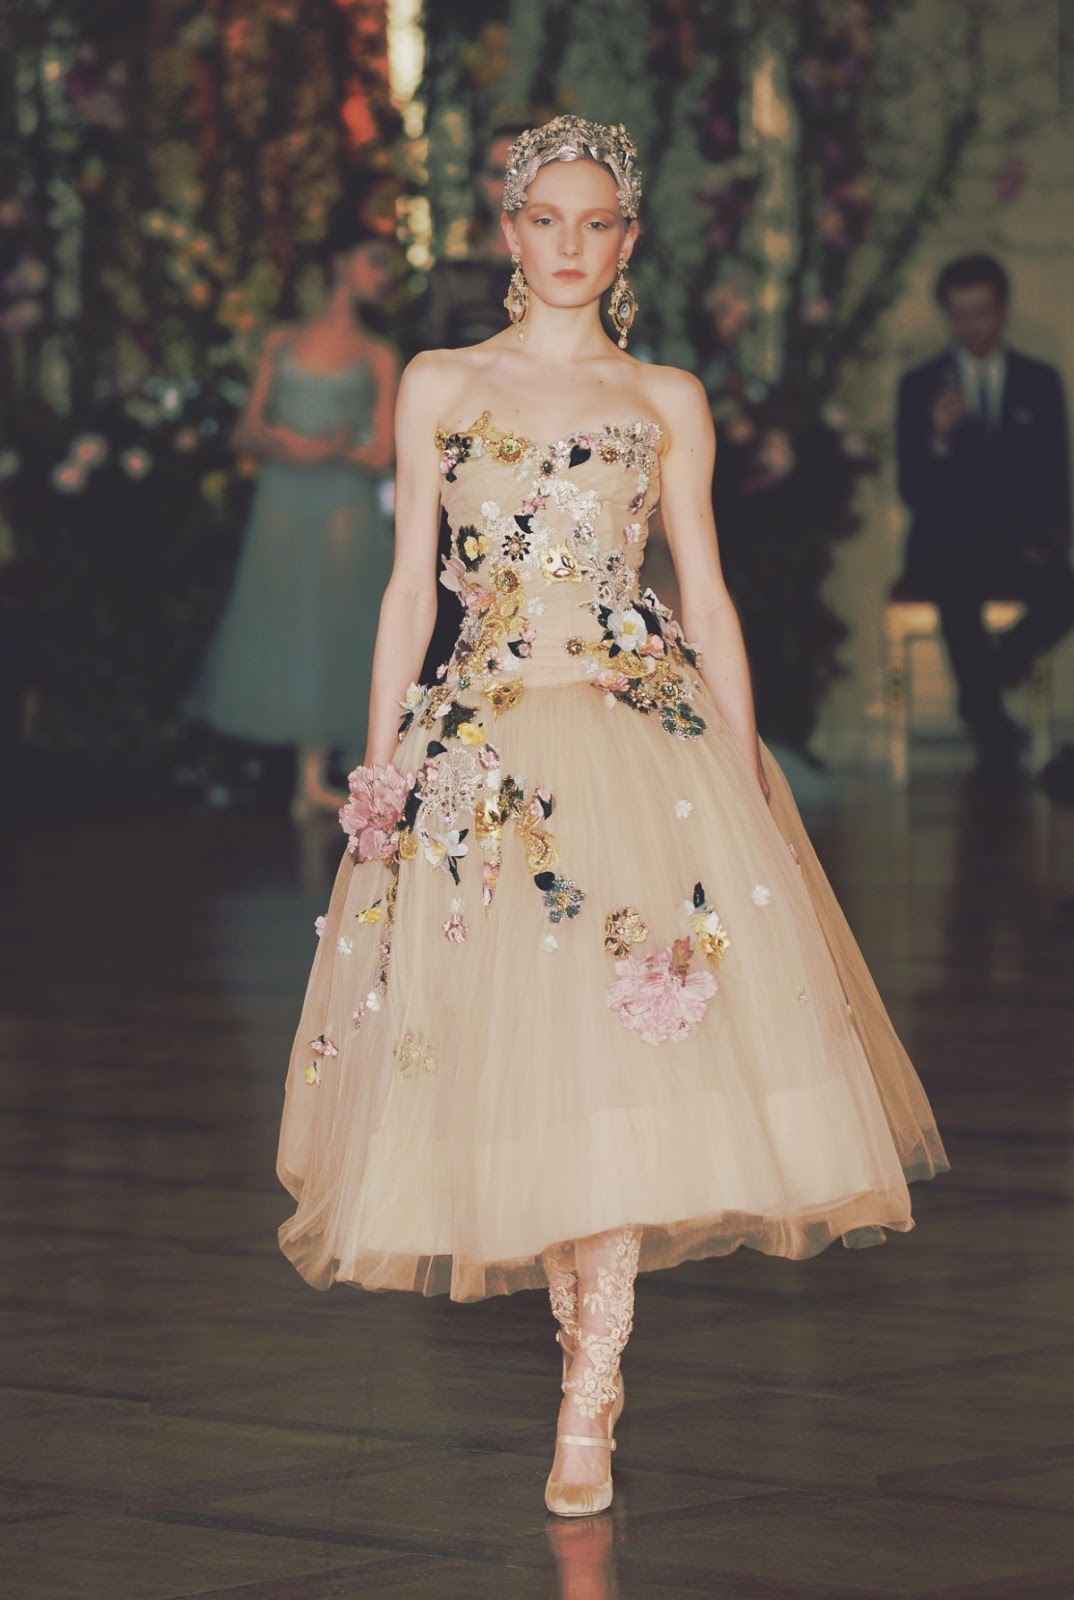 Fashion Moda Penélope Cruz In Vogue June Issue: Dolce & Gabbana Alta Moda Spring/Summer